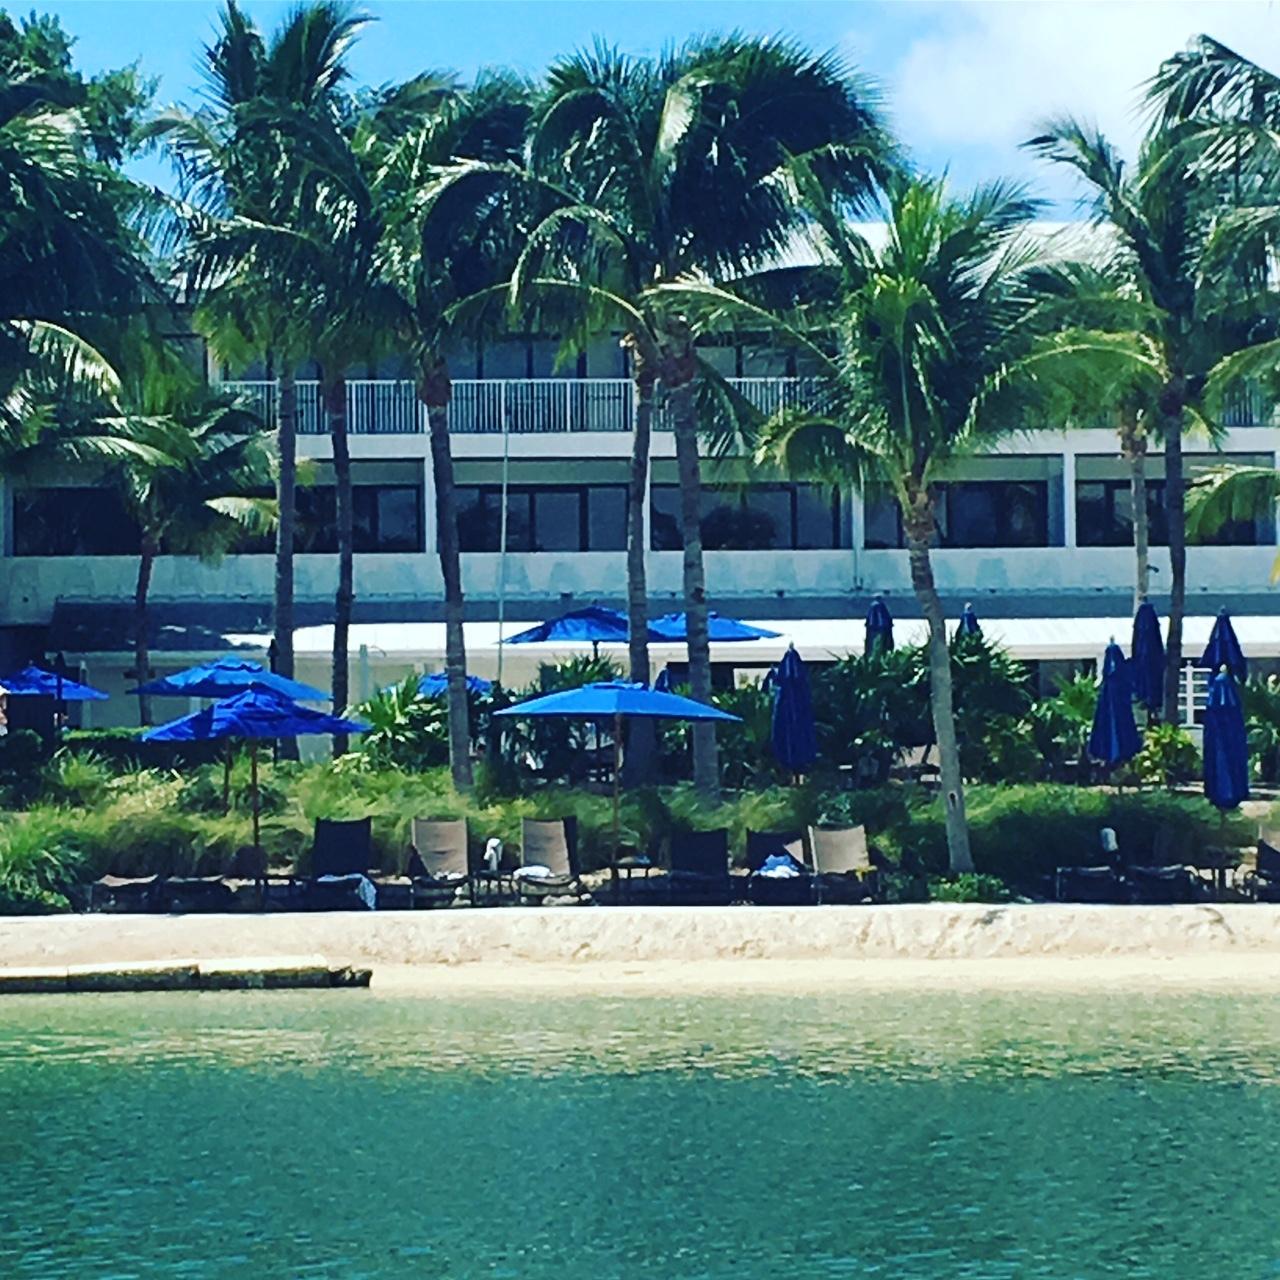 hawks cay resort - snorkeling - marathon key - florida keys - empty nester getaway - romantic getaway idea - getaway idea for couples - empty nest travel - empty nest - empty nester